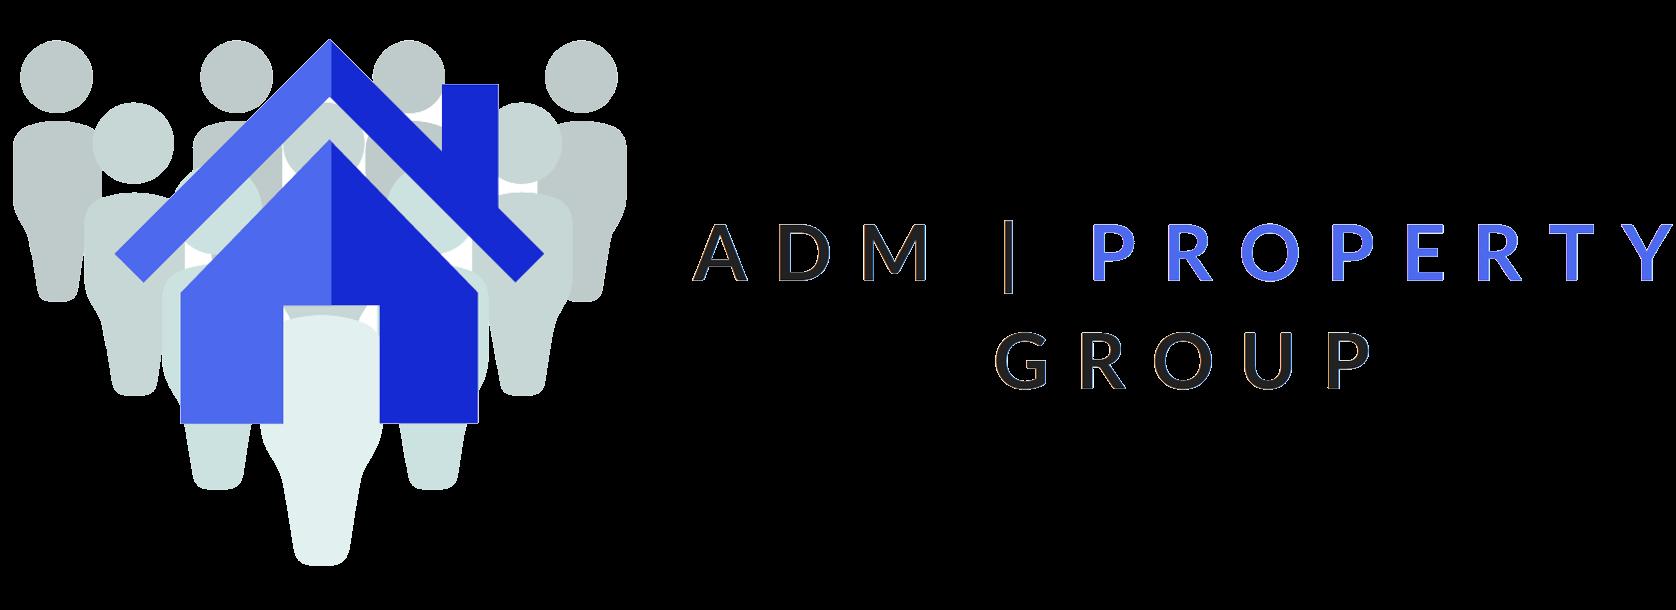 ADM Property Group